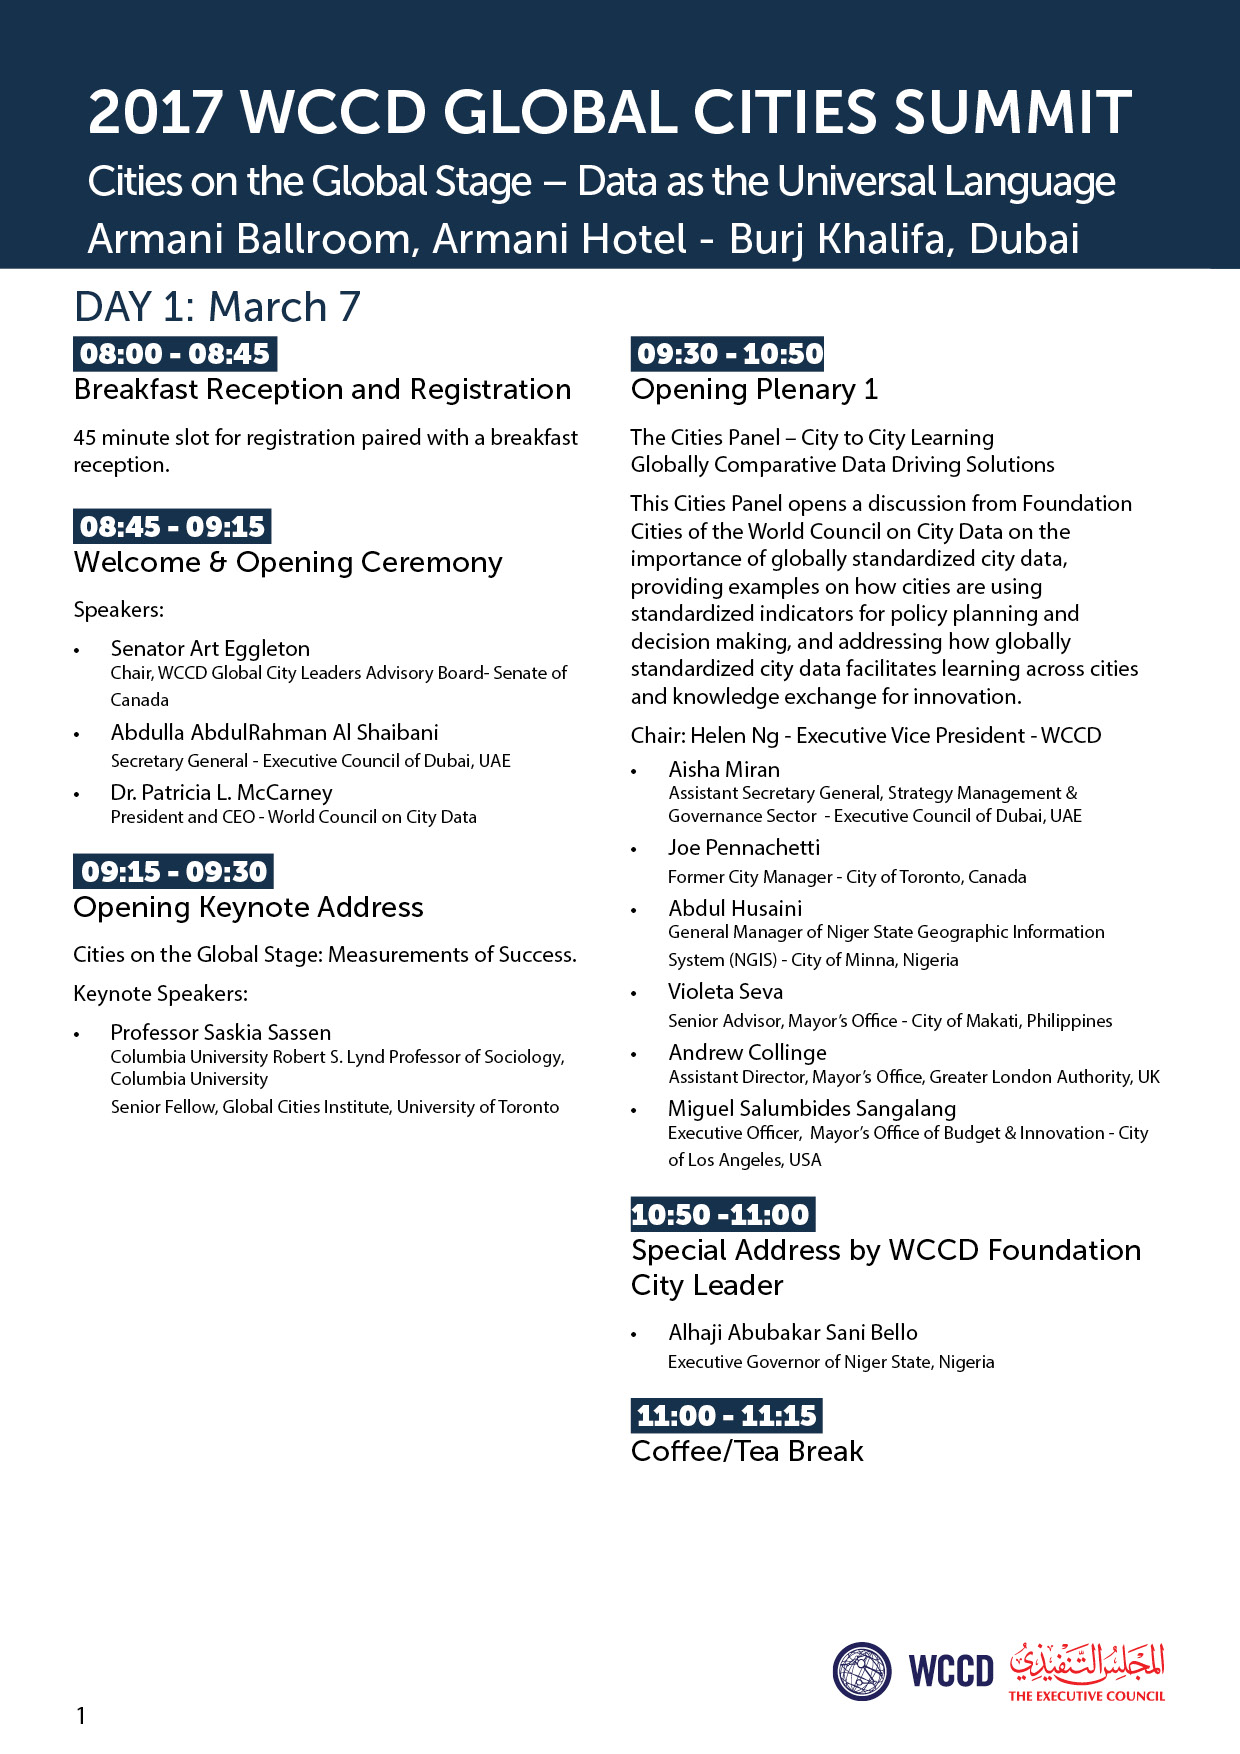 2017 WCCD Global Cities Summit Draft Agenda - Dubai-page-001 (1).jpg